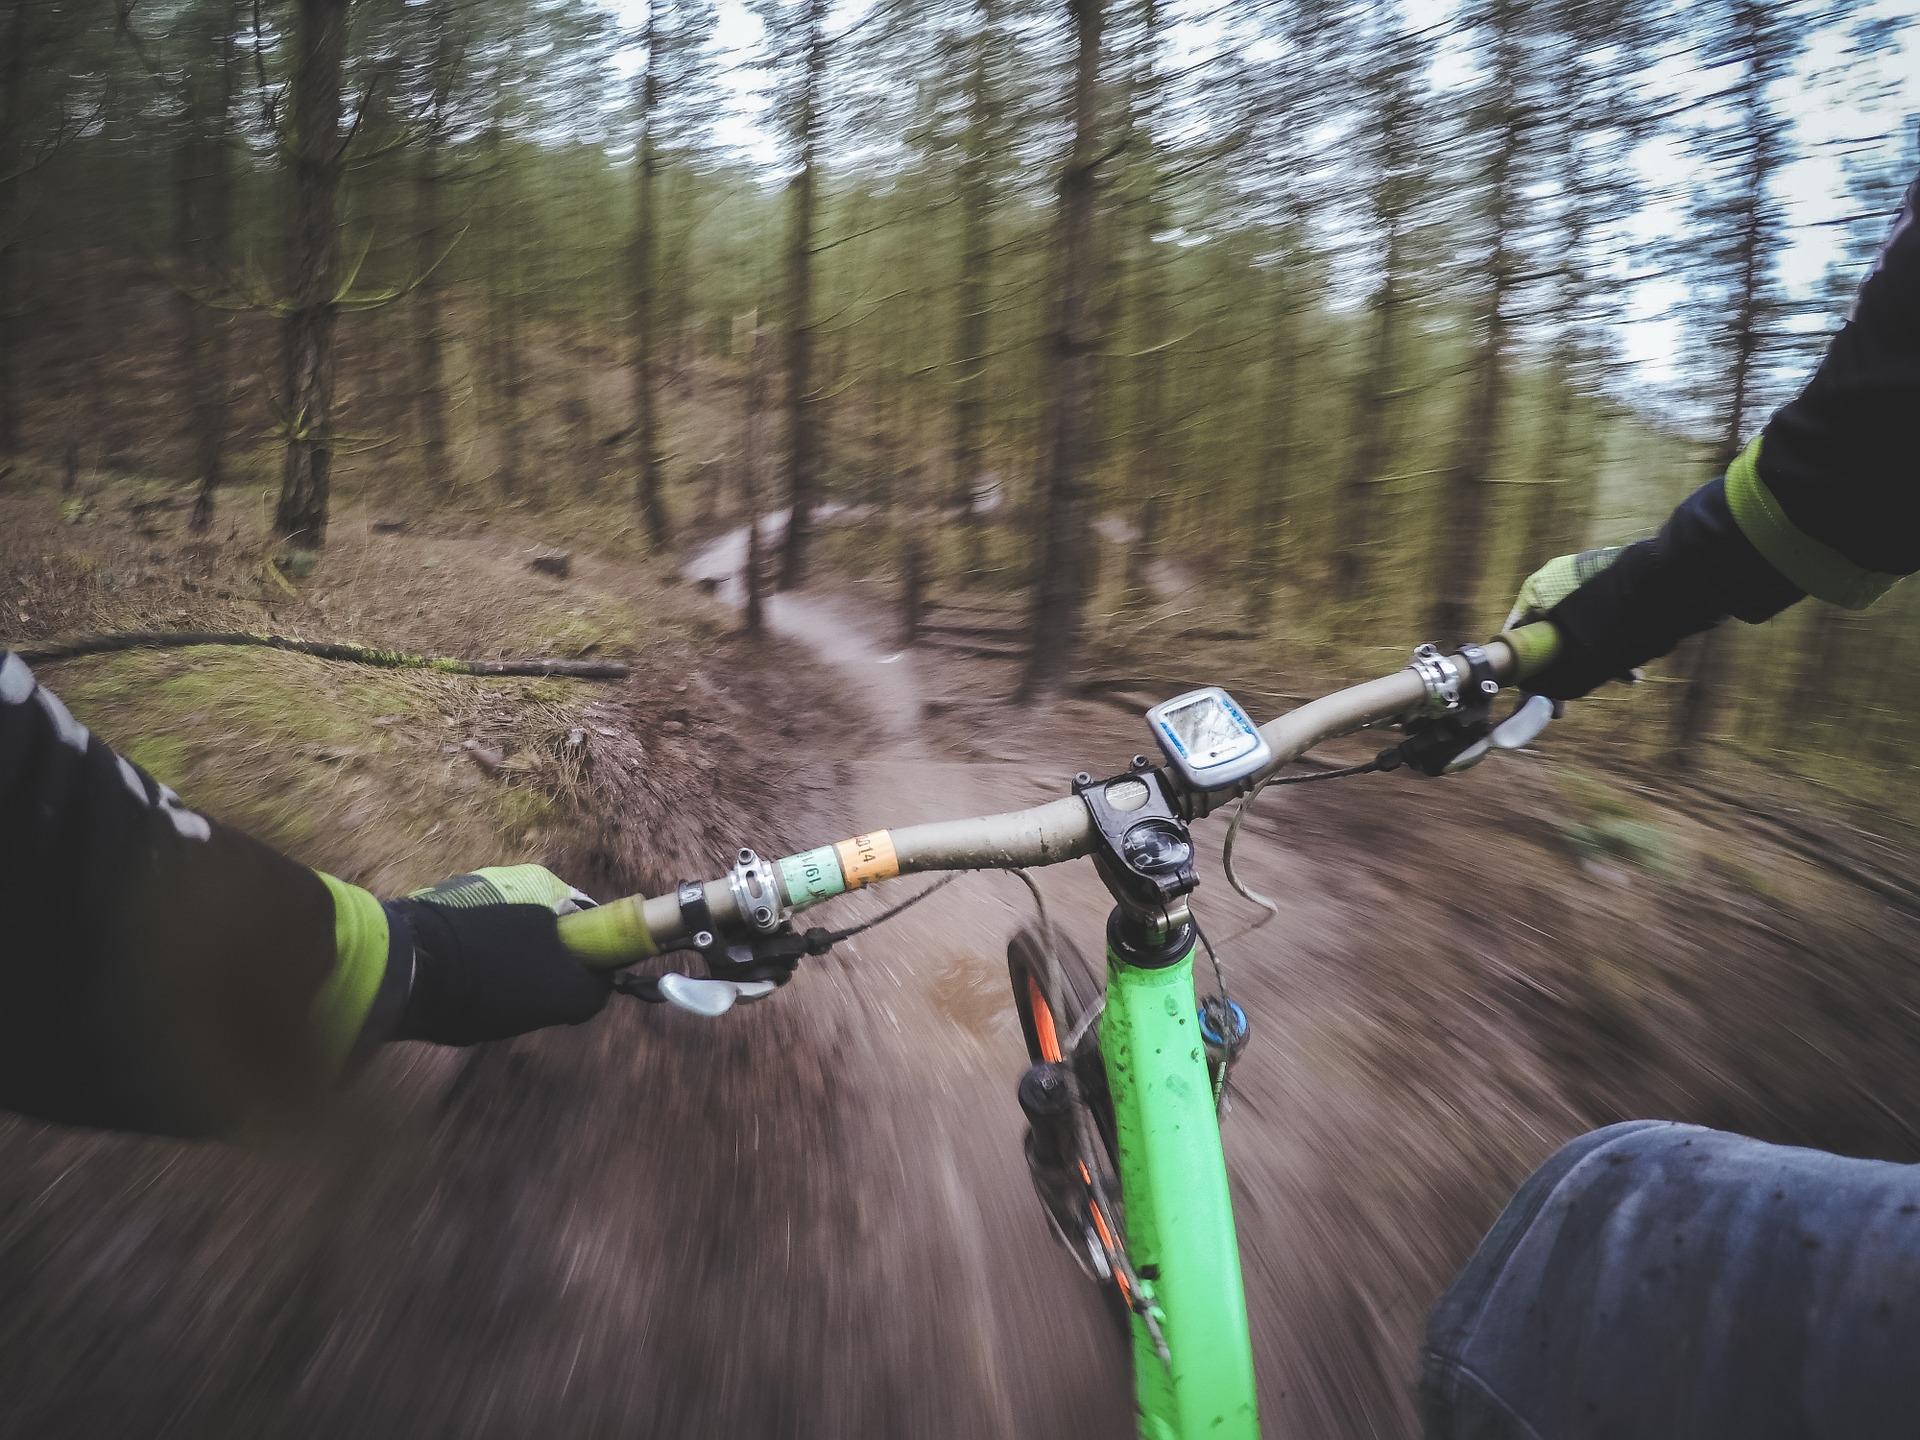 ciclismo, bicicleta, montaña, riesgo, extremo - Fondos de Pantalla HD - professor-falken.com